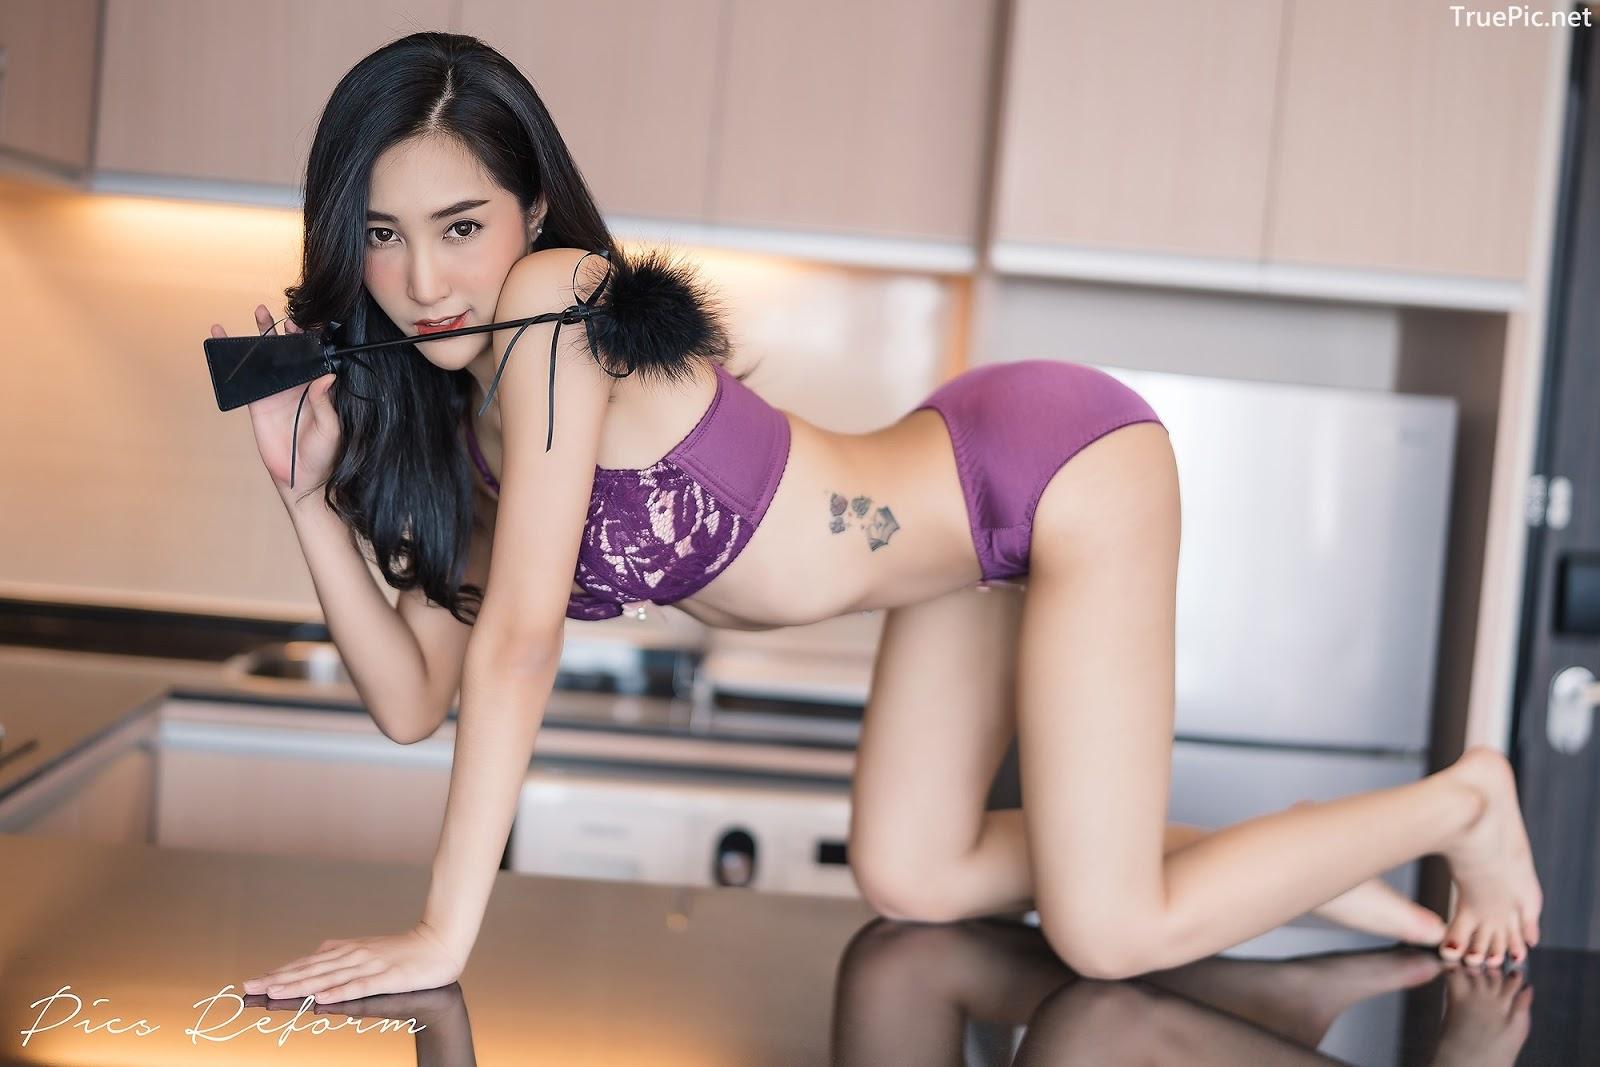 Image-Thailand-Sexy-Model-Yanapat-Ukkararujipat-Violet-Girl-TruePic.net- Picture-3